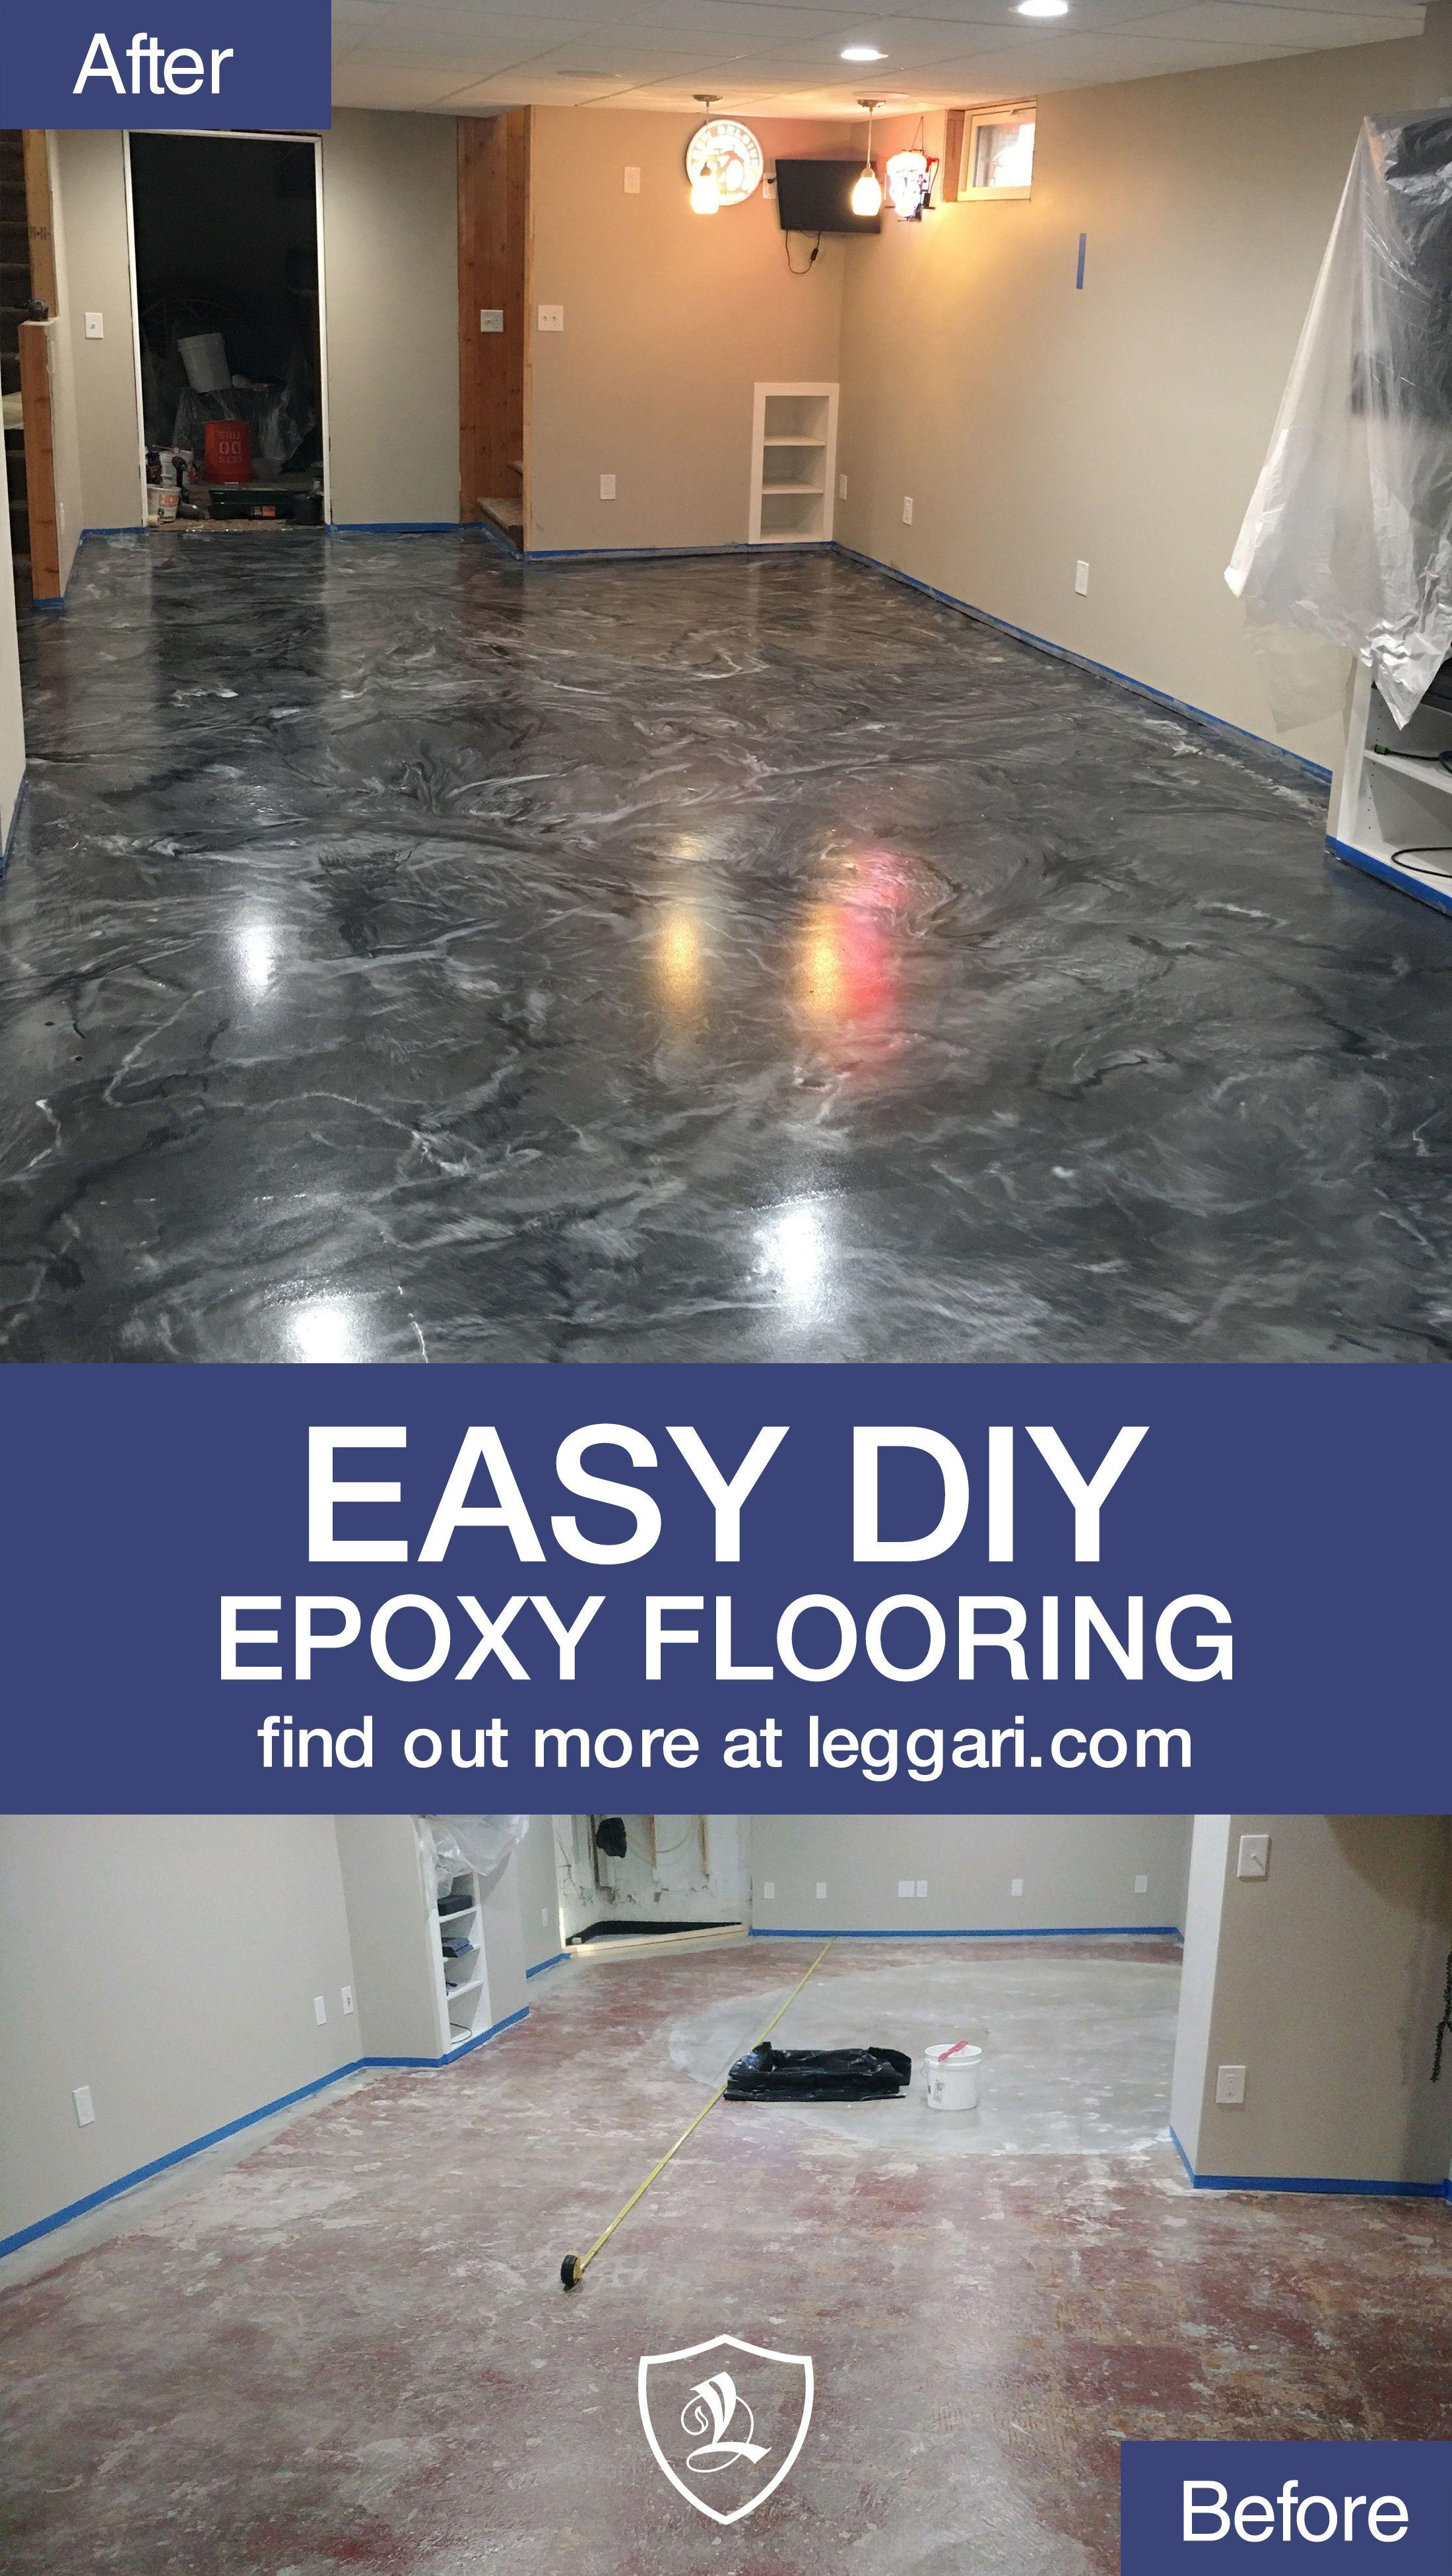 Pin By Evan Baker On Epoxy Diy Flooring Epoxy Resin Flooring Diy Resin Flooring Resin Diy